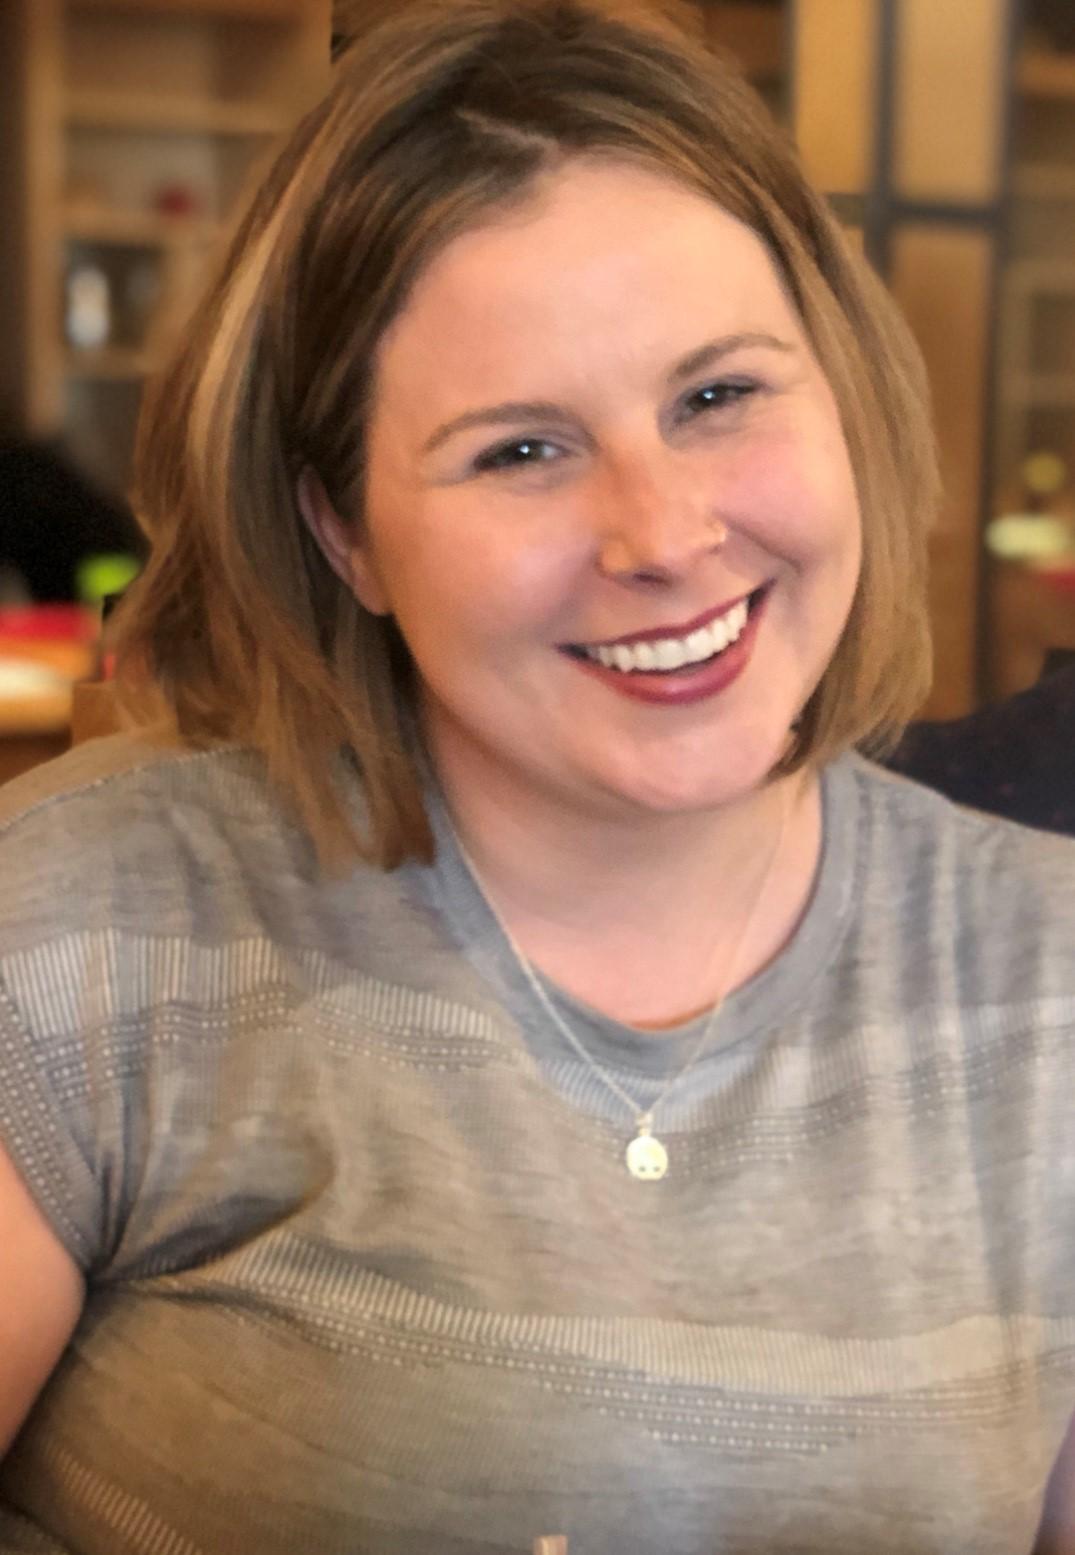 Headshot of Megan Kasper